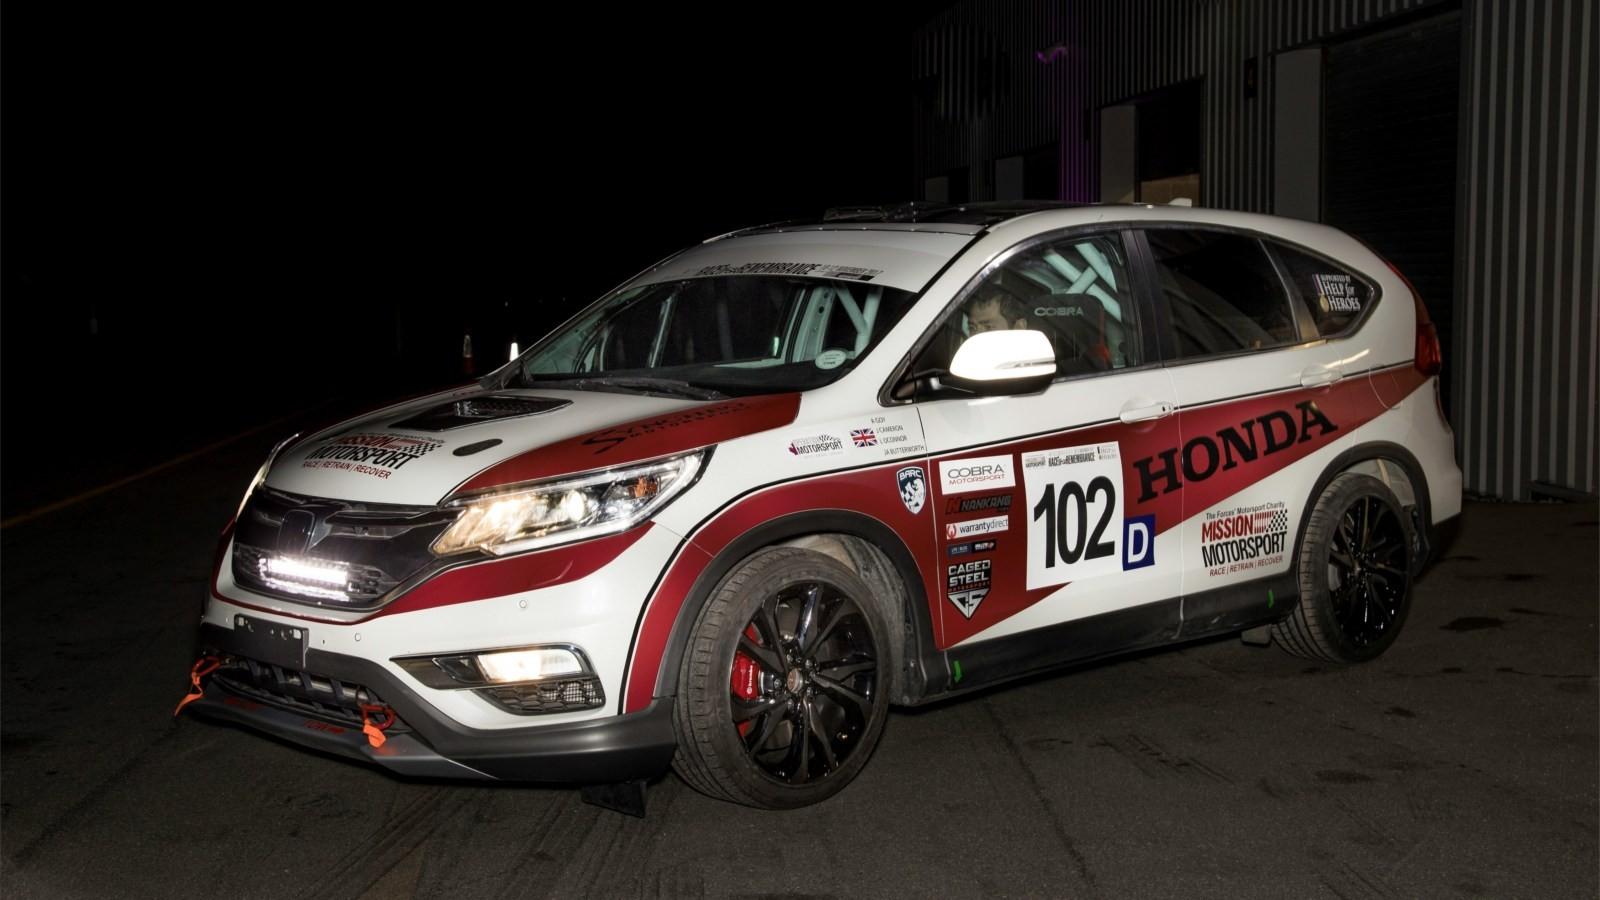 123604_Honda_UK_and_Mission_Motorsport_create_first_ever_CR_V_diesel_race_car_for